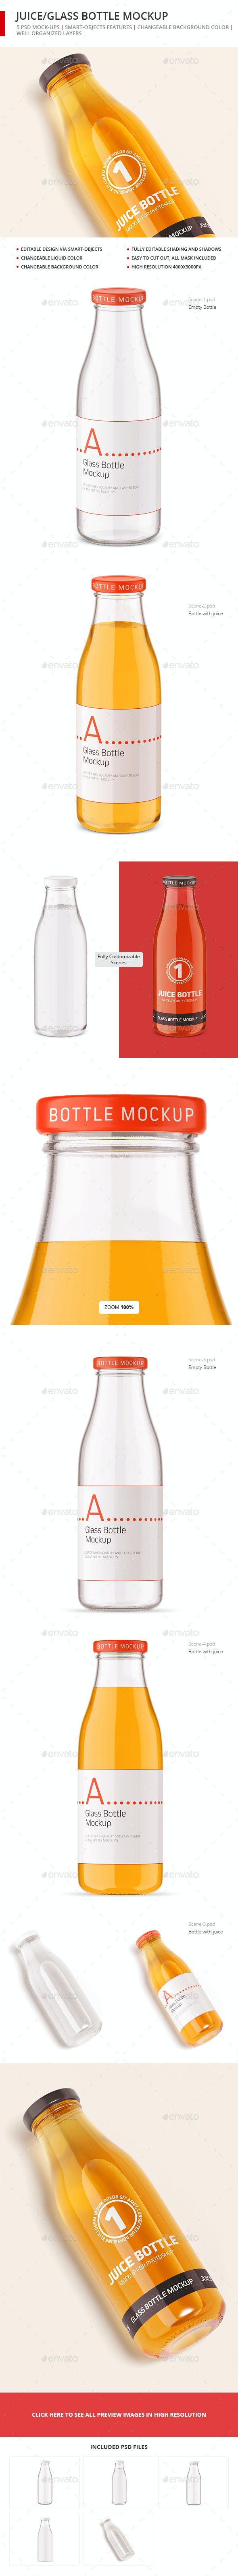 Juice / Glass Bottle Mockup - Food and Drink Packaging